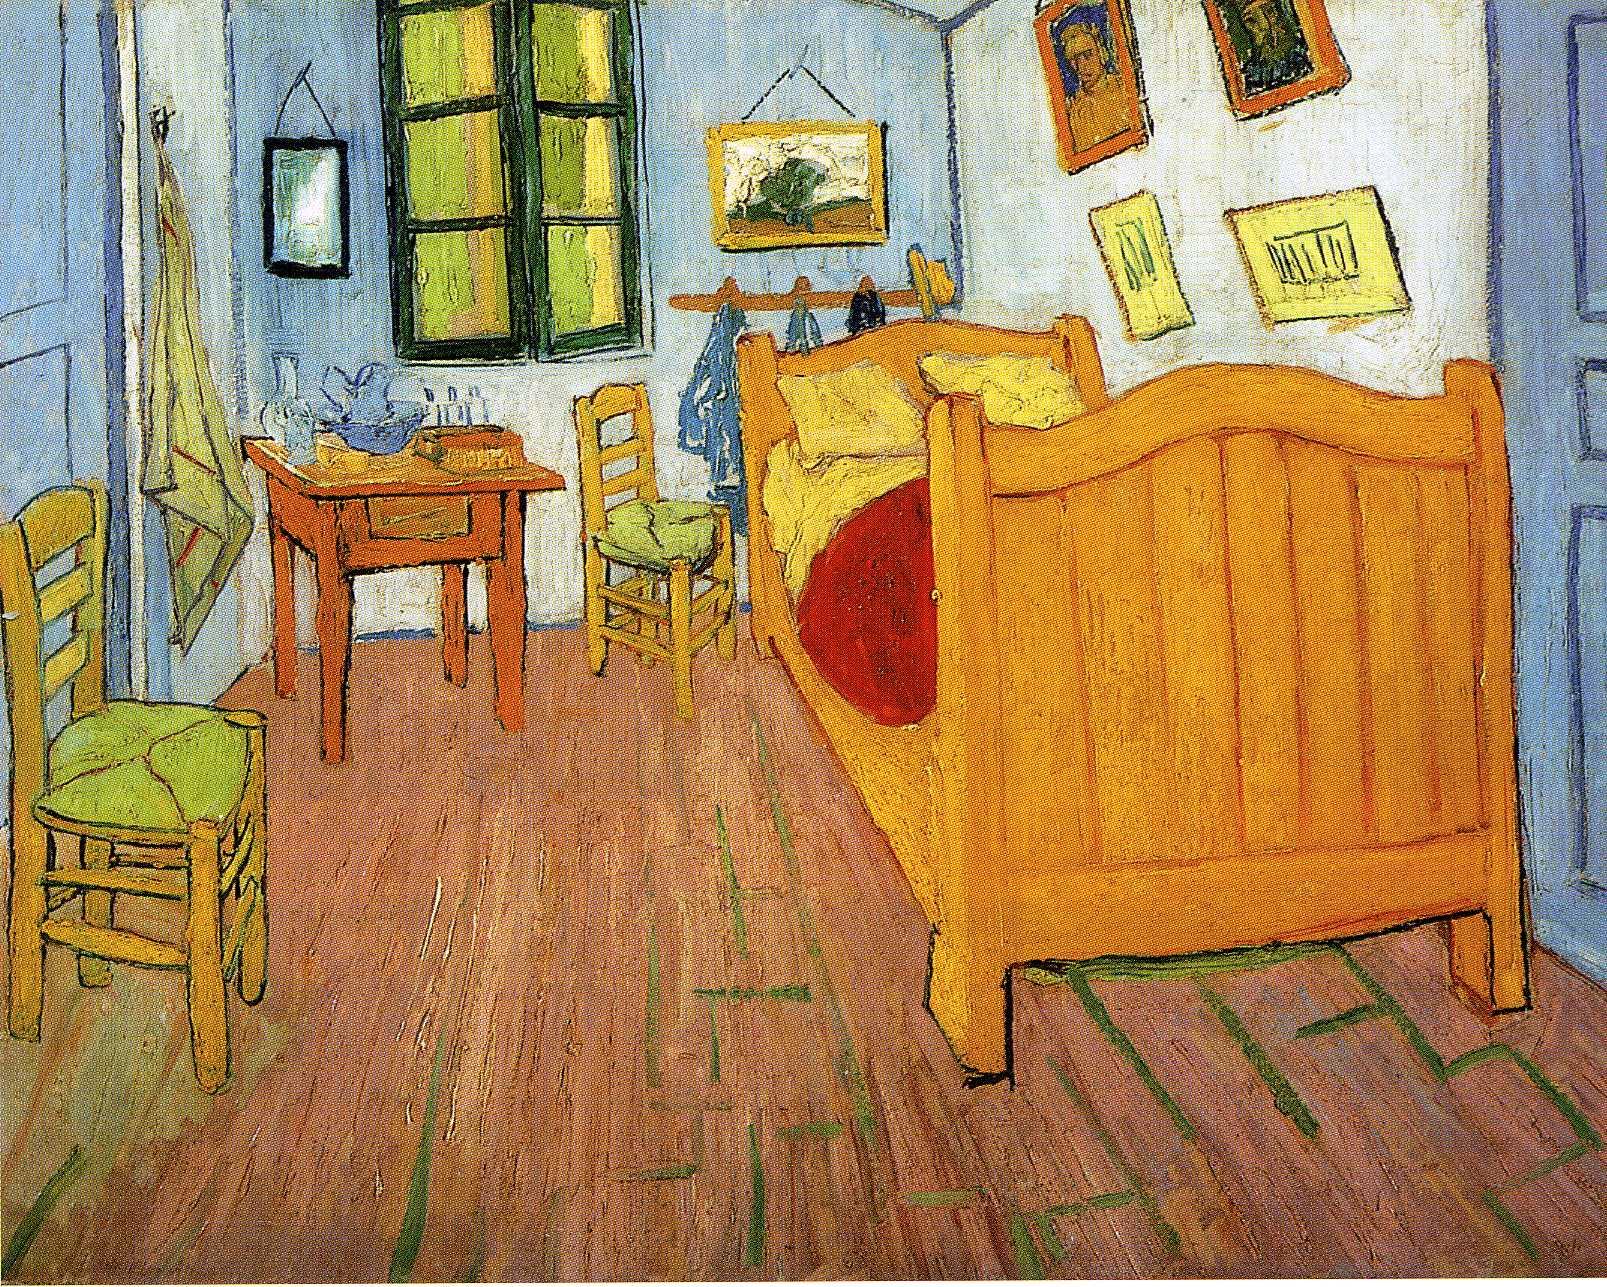 2012 nike air max pour les enfants - Vincent\u0026#39;s Bedroom in Arles - Vincent van Gogh - WikiArt.org ...